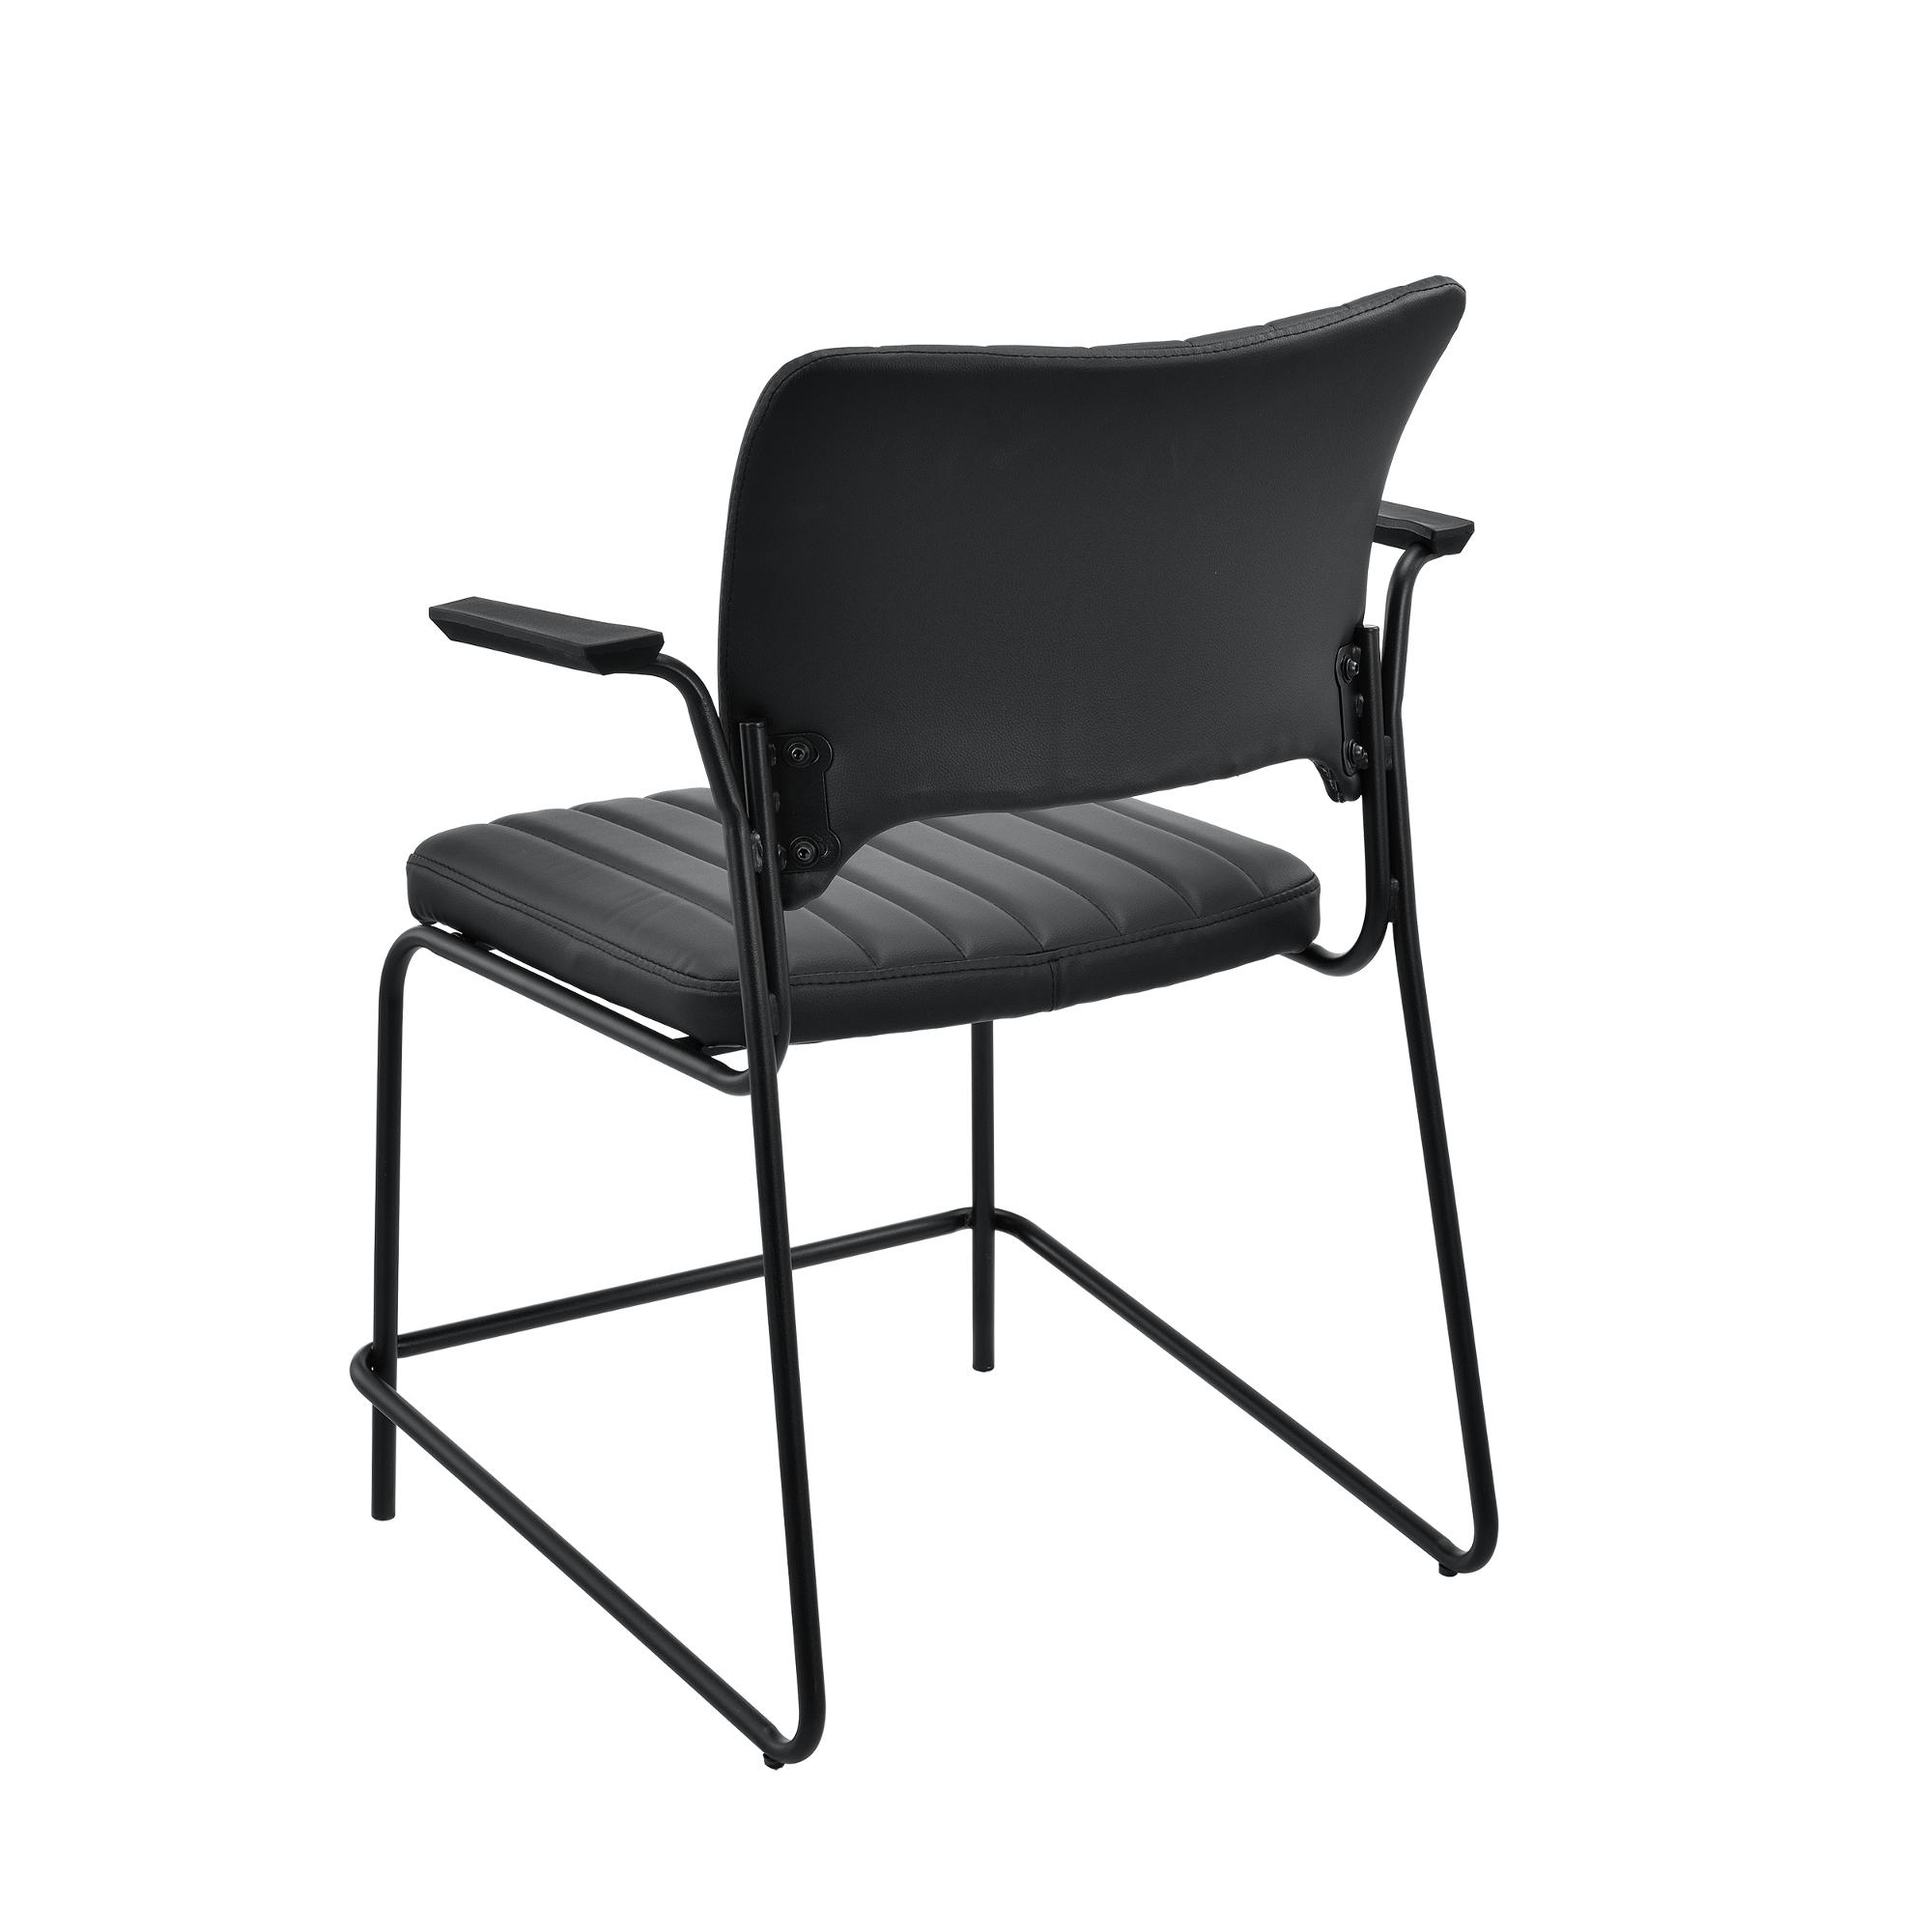 [en.casa]® Konferenzstuhl 2er Set schwarz Besucherstuhl Büro Stuhl Stapelstuhl 5